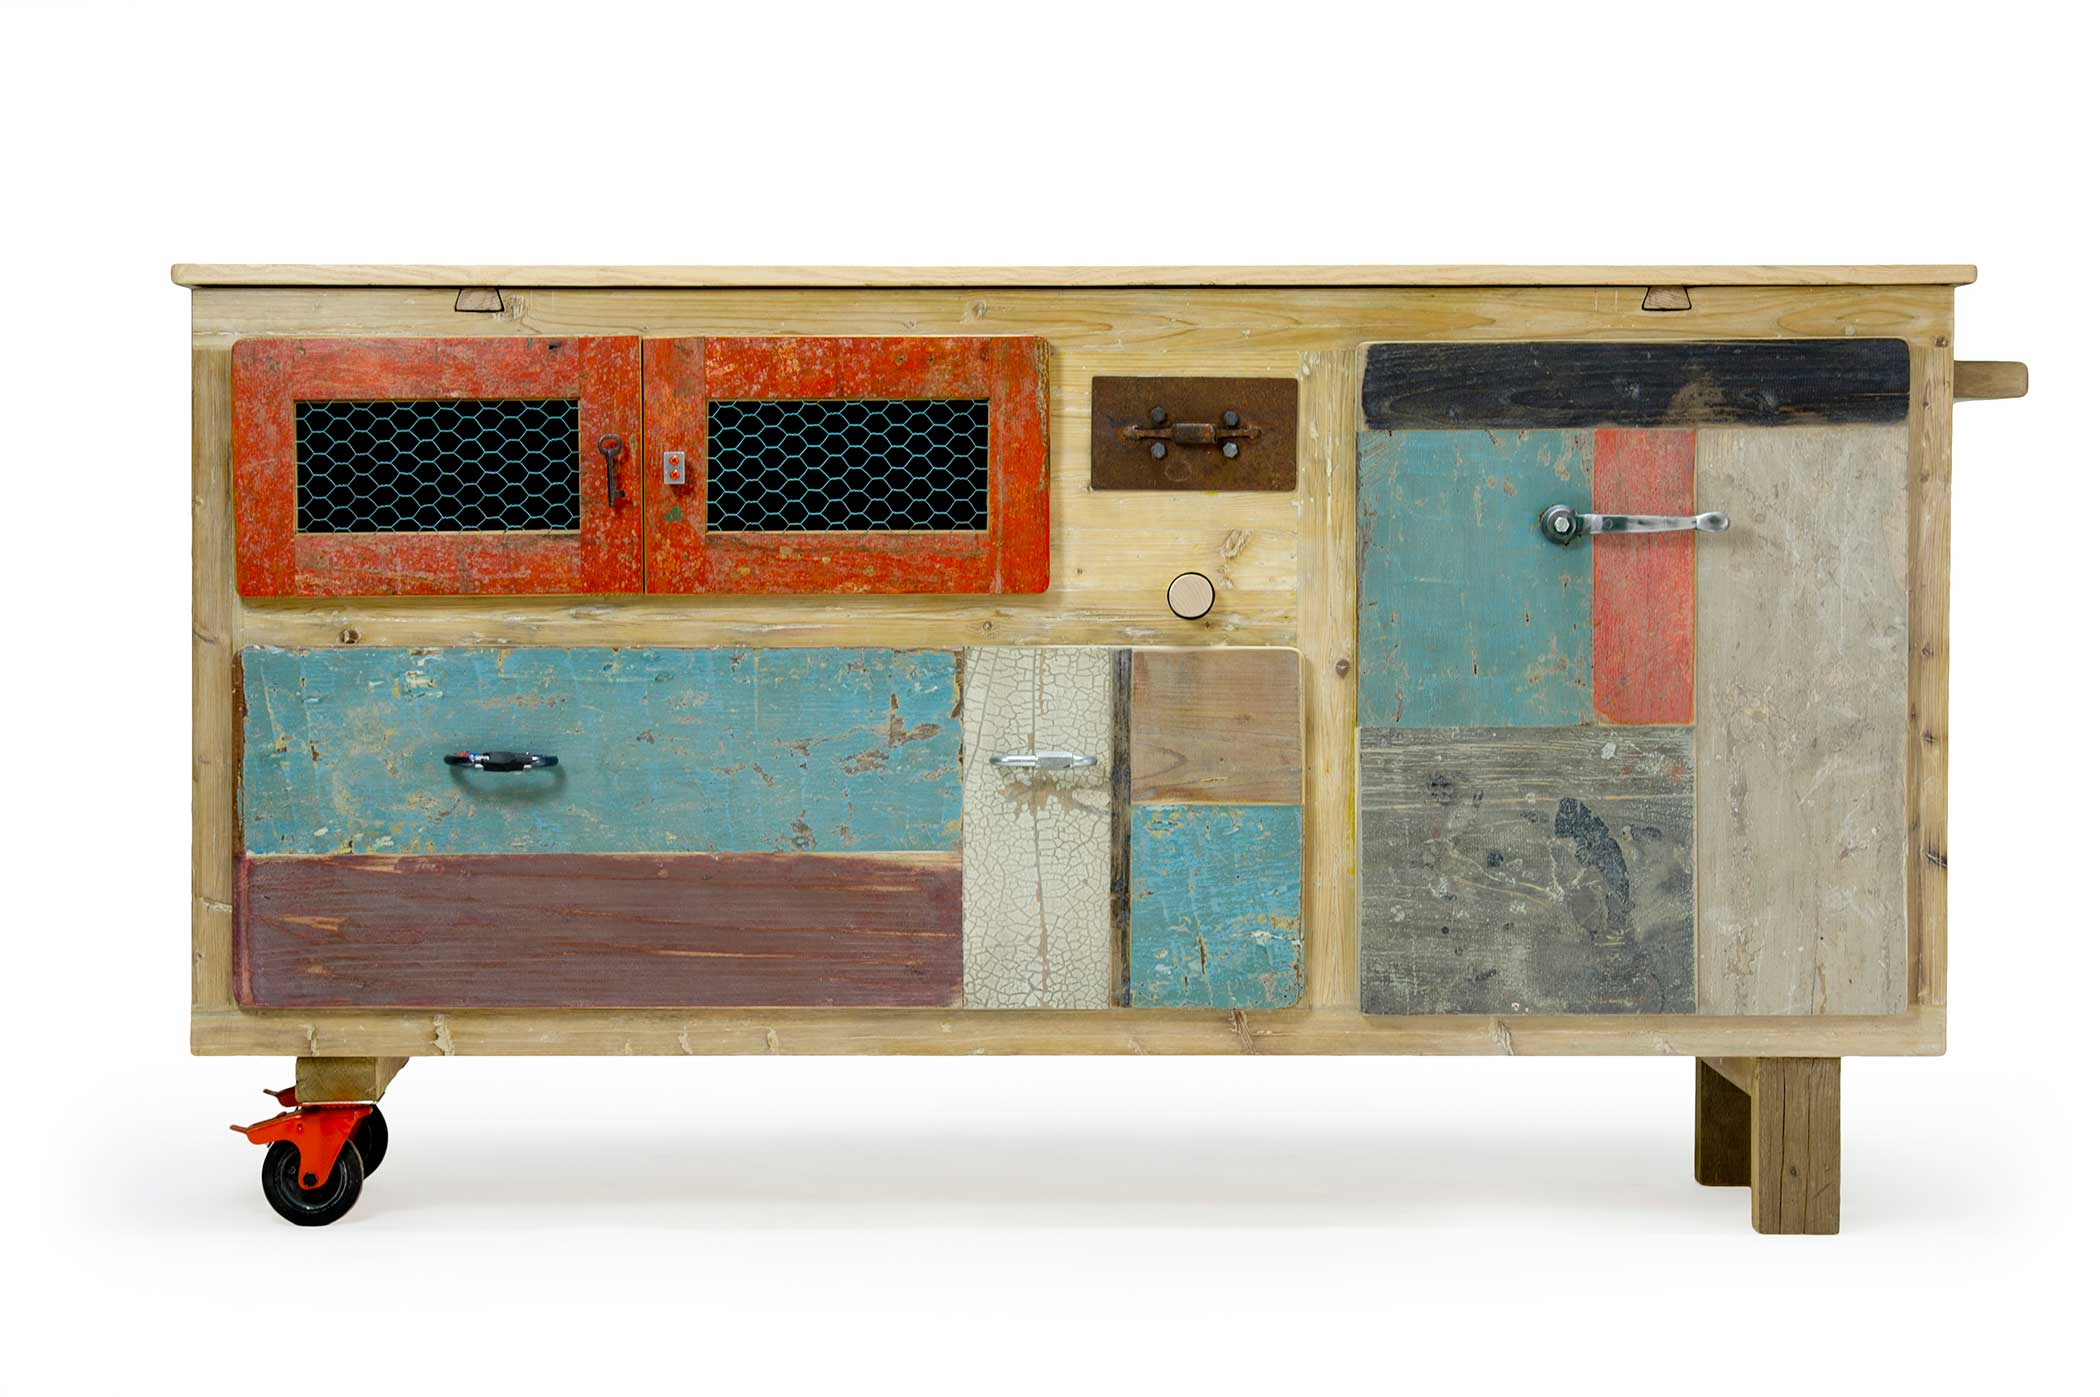 Credenza Bassa Fai Da Te : Credenze da cucina legno moderne industrial laquercia